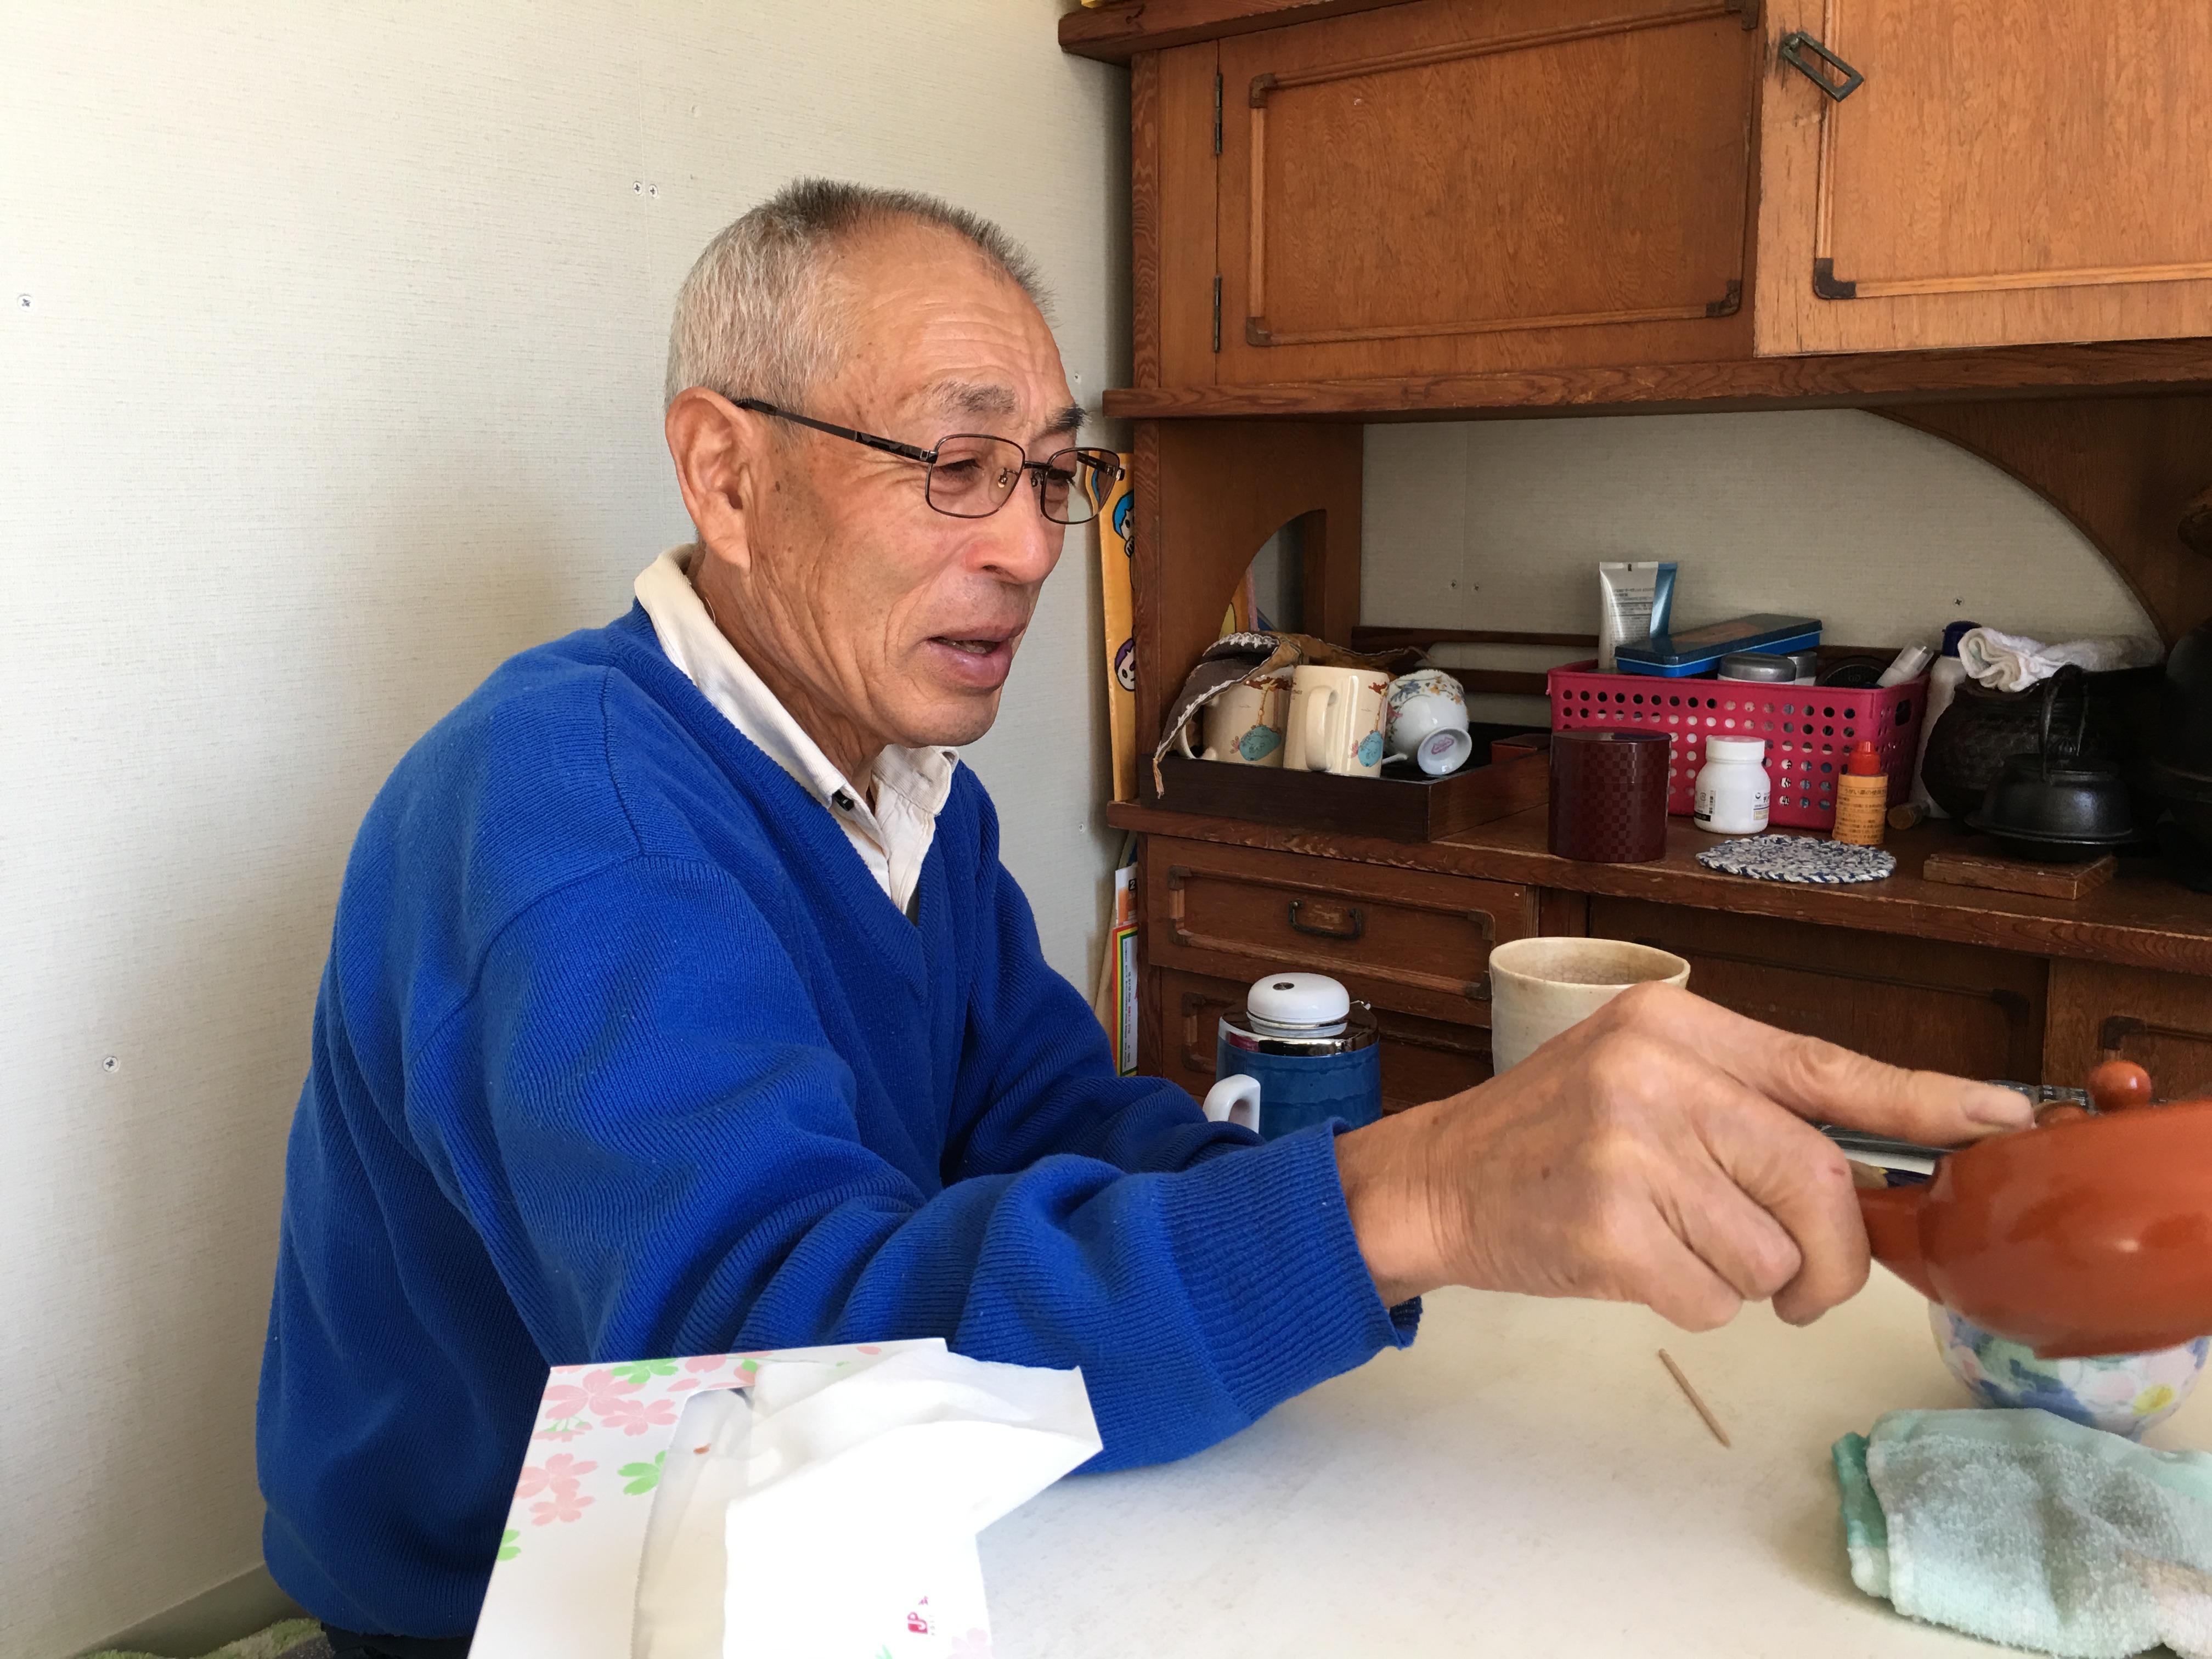 otsuchi kanako dad makes tes.JPG